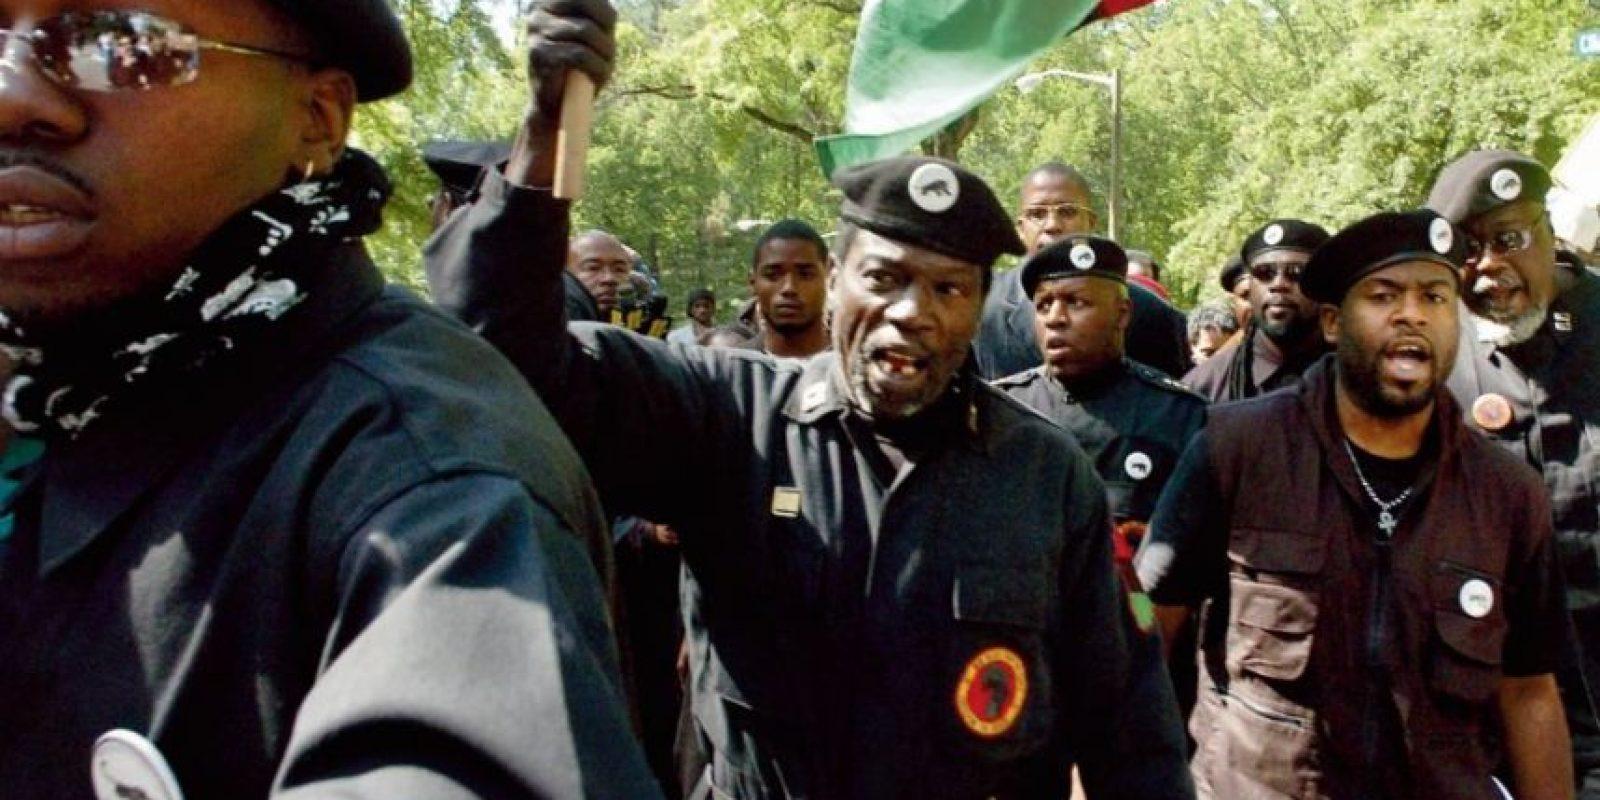 El ascenso de los grupos de poder negro. Foto:Getty